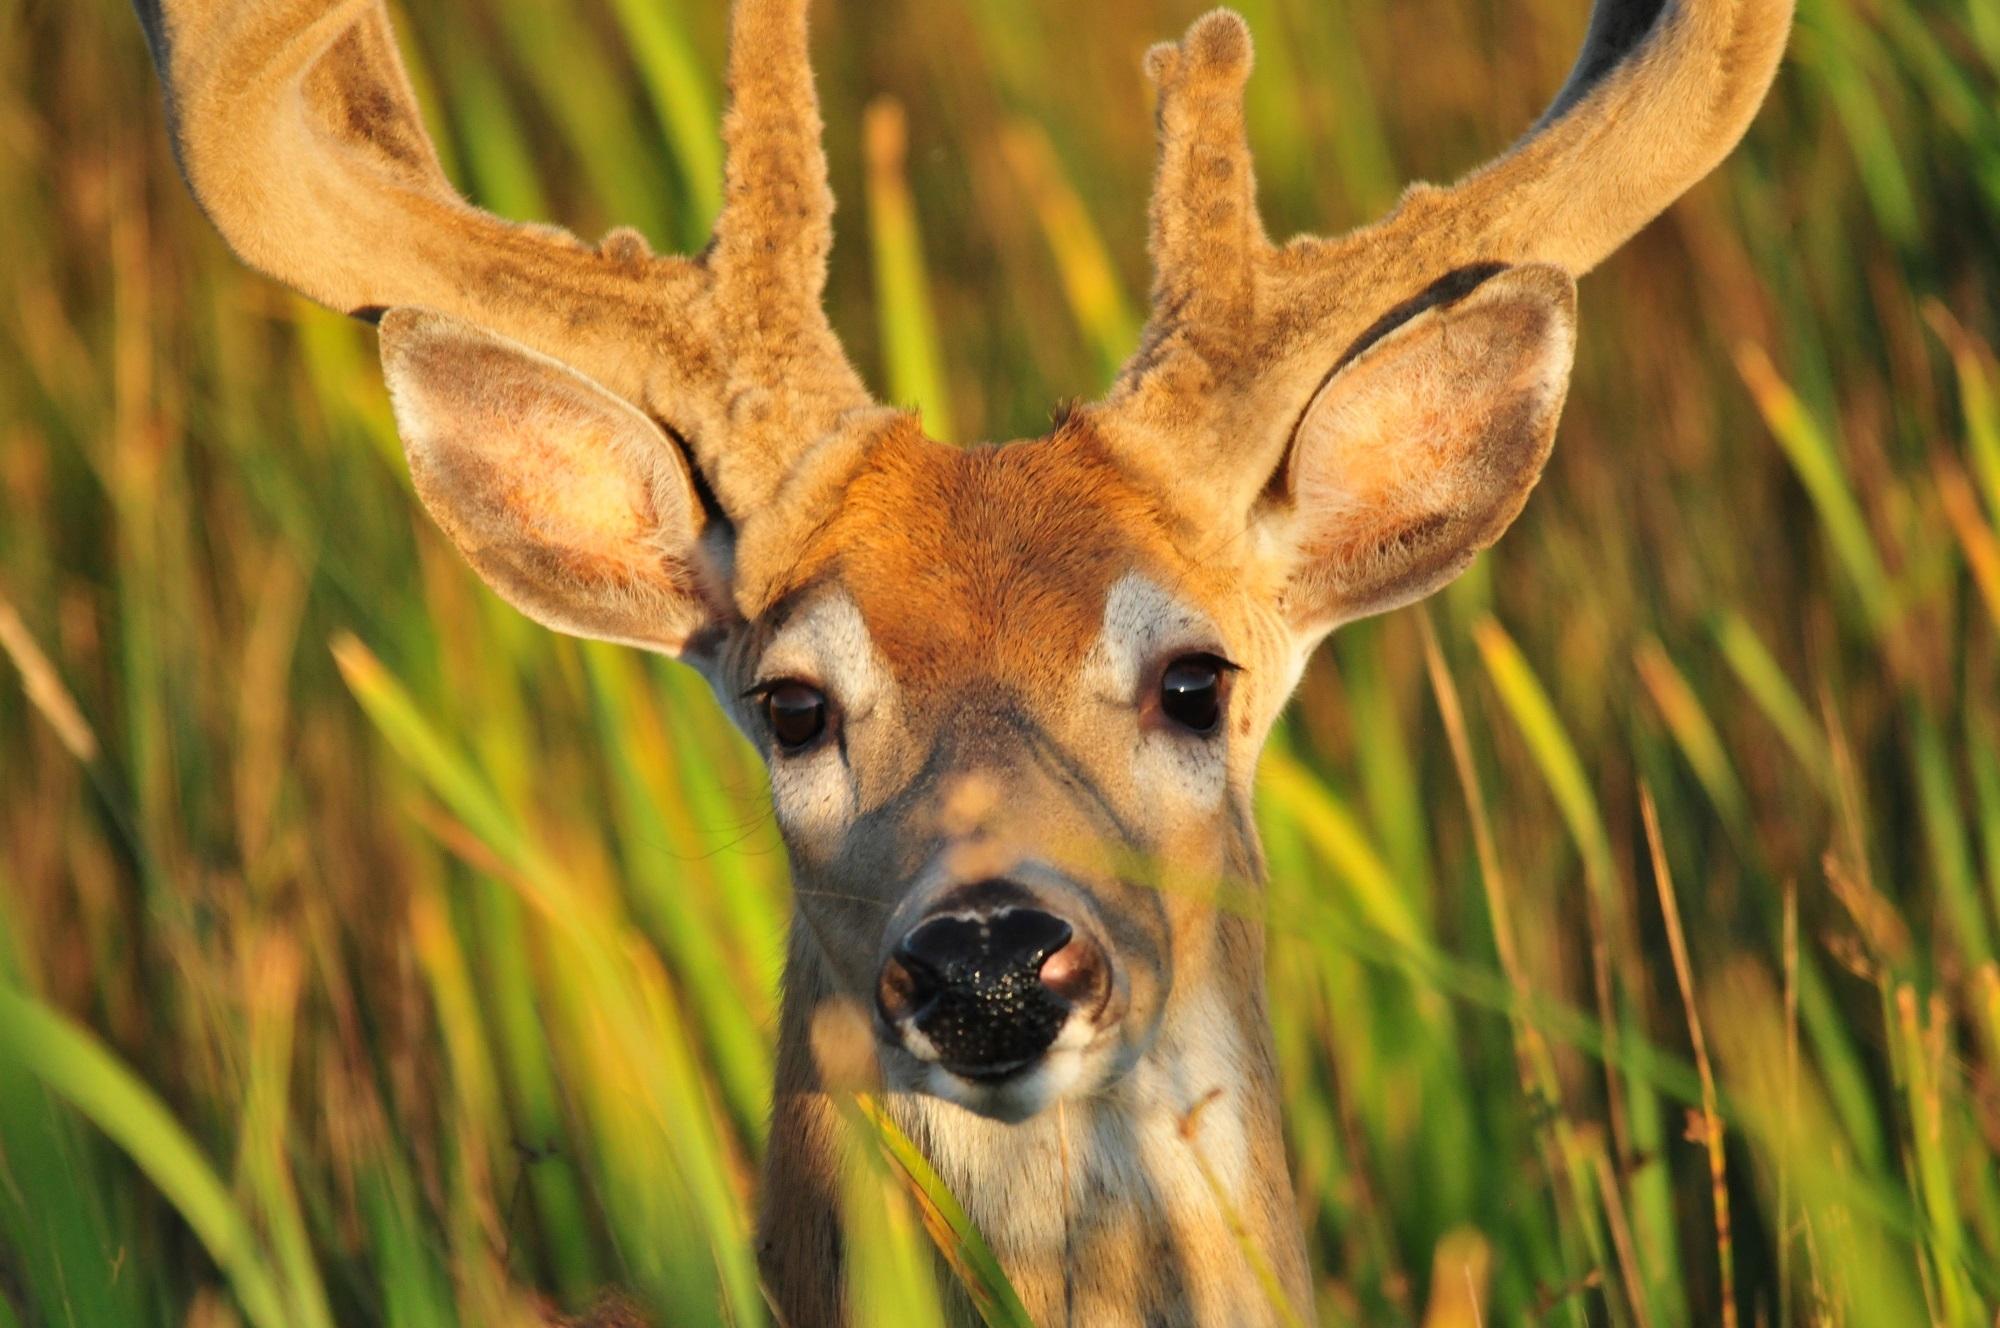 Lonely deer photo